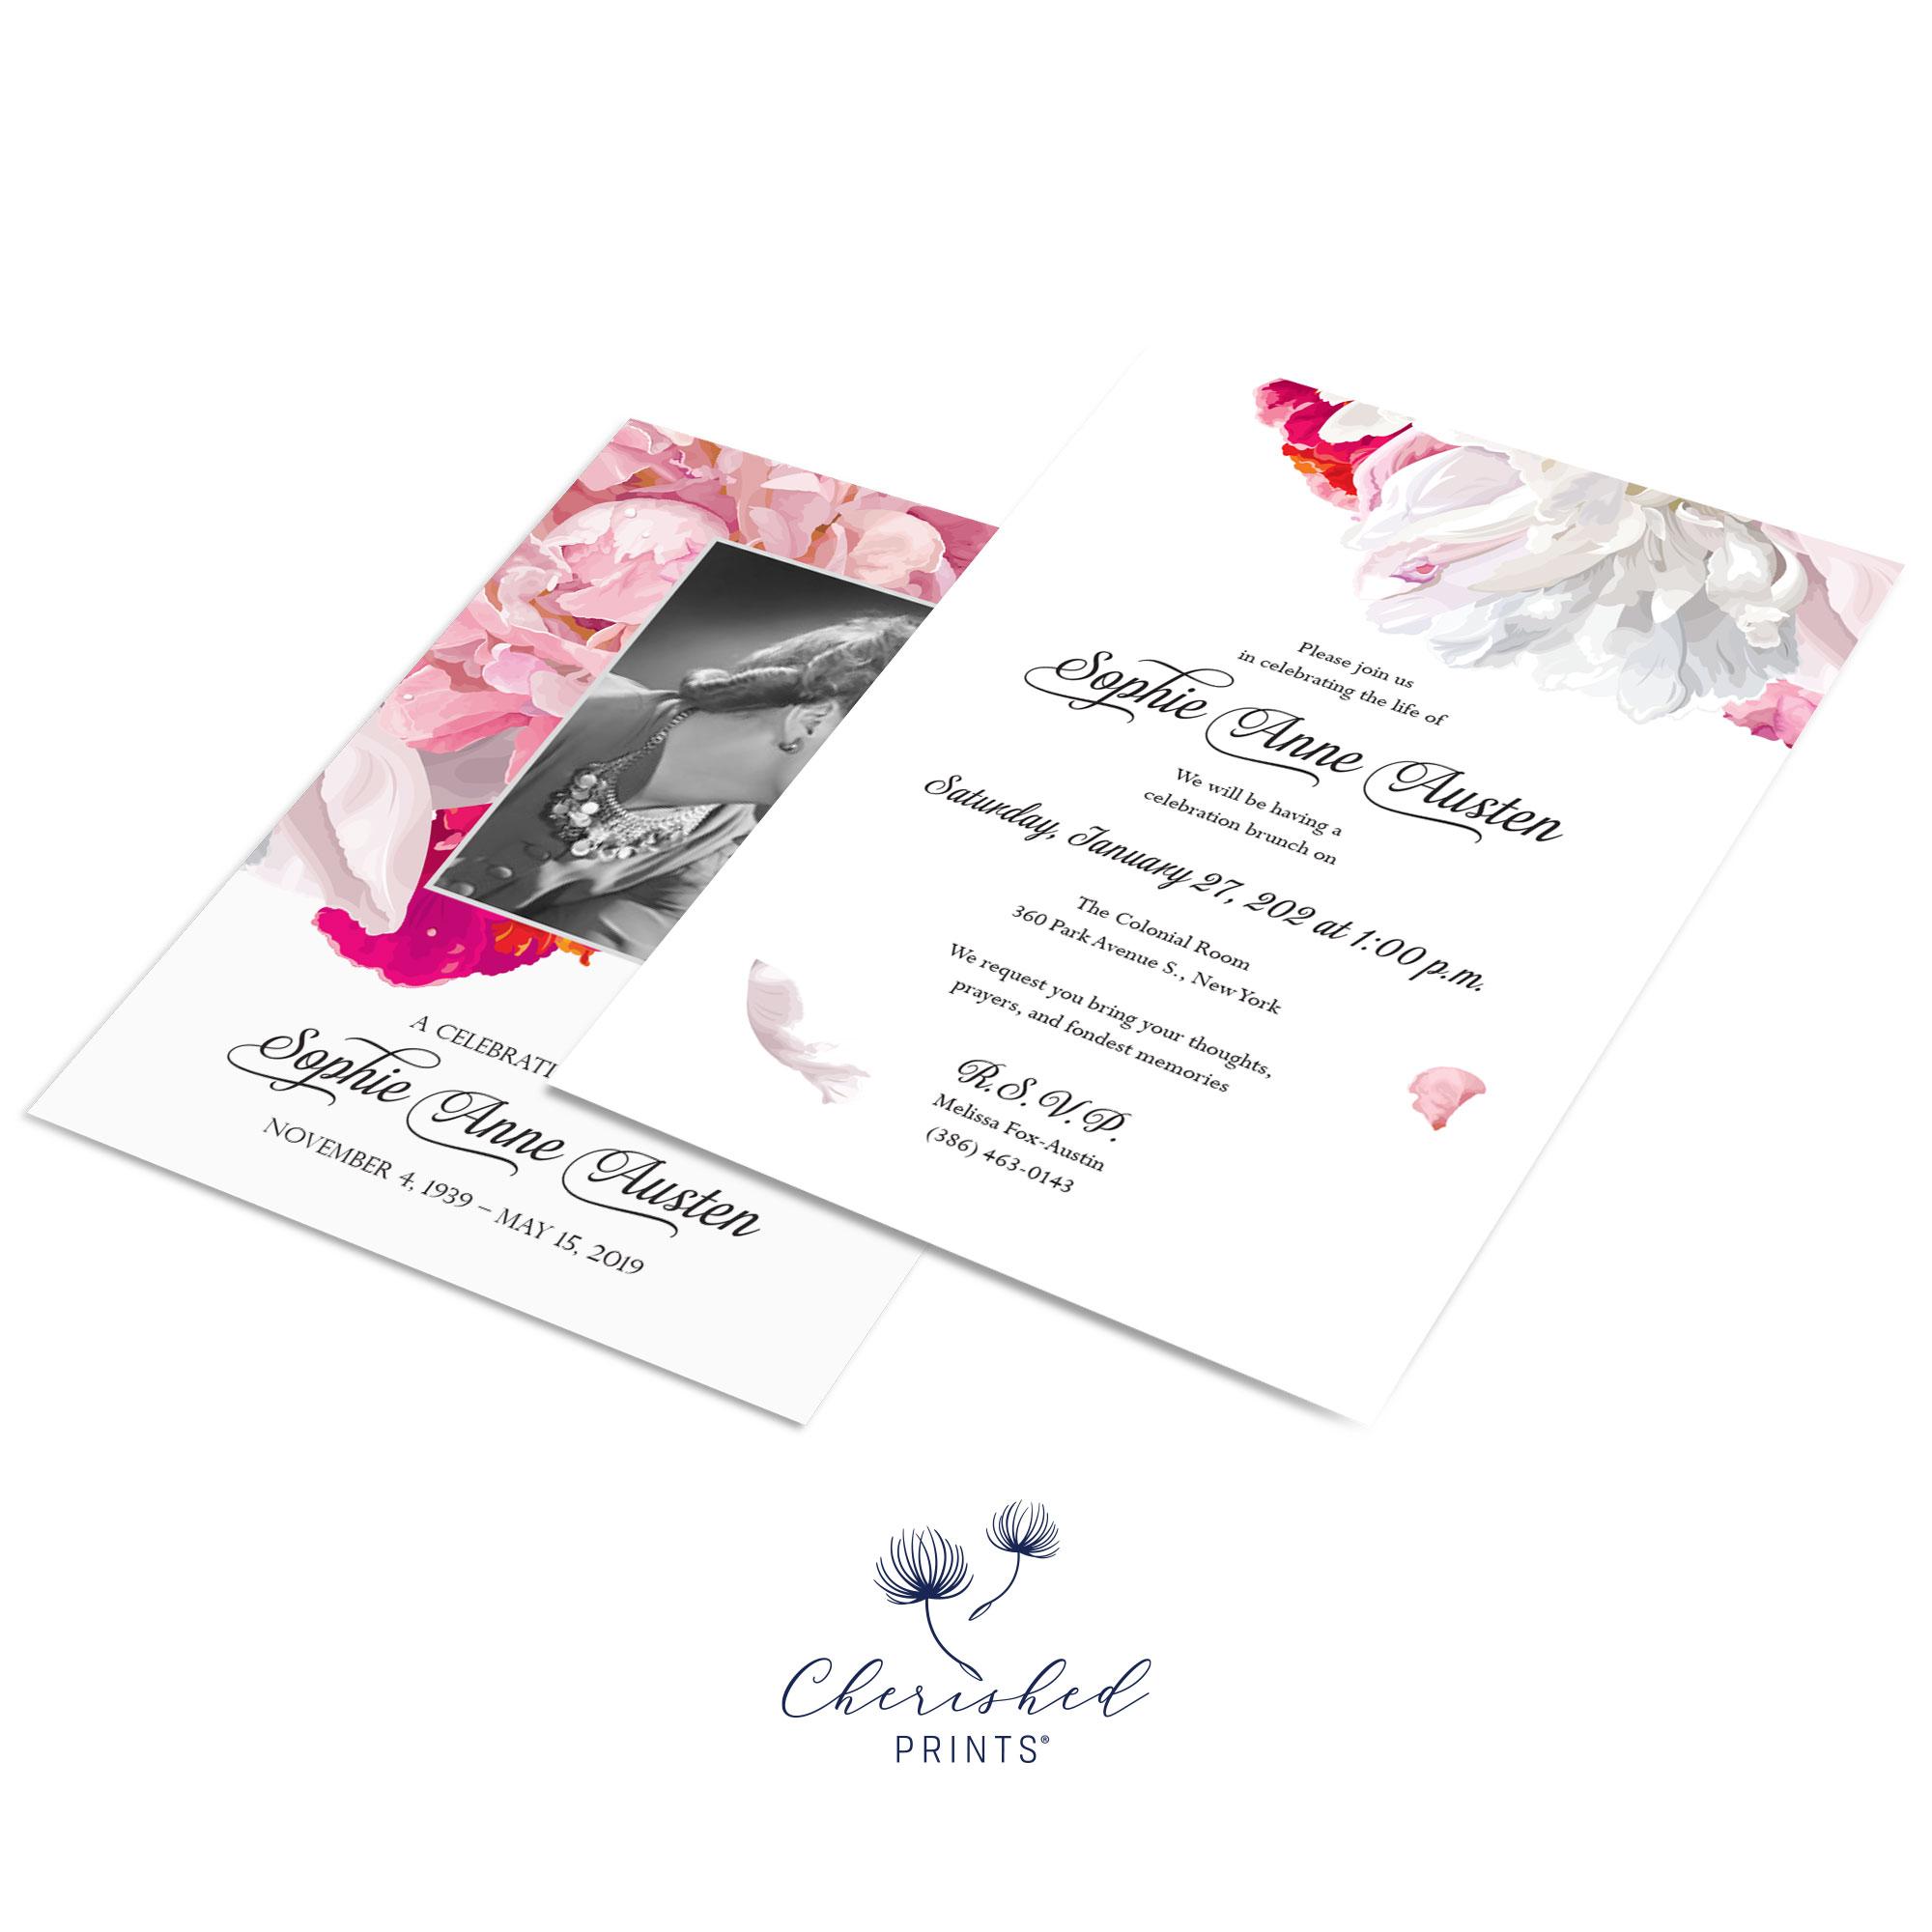 Beautiful soft pink and white peonies celebration of life invitation